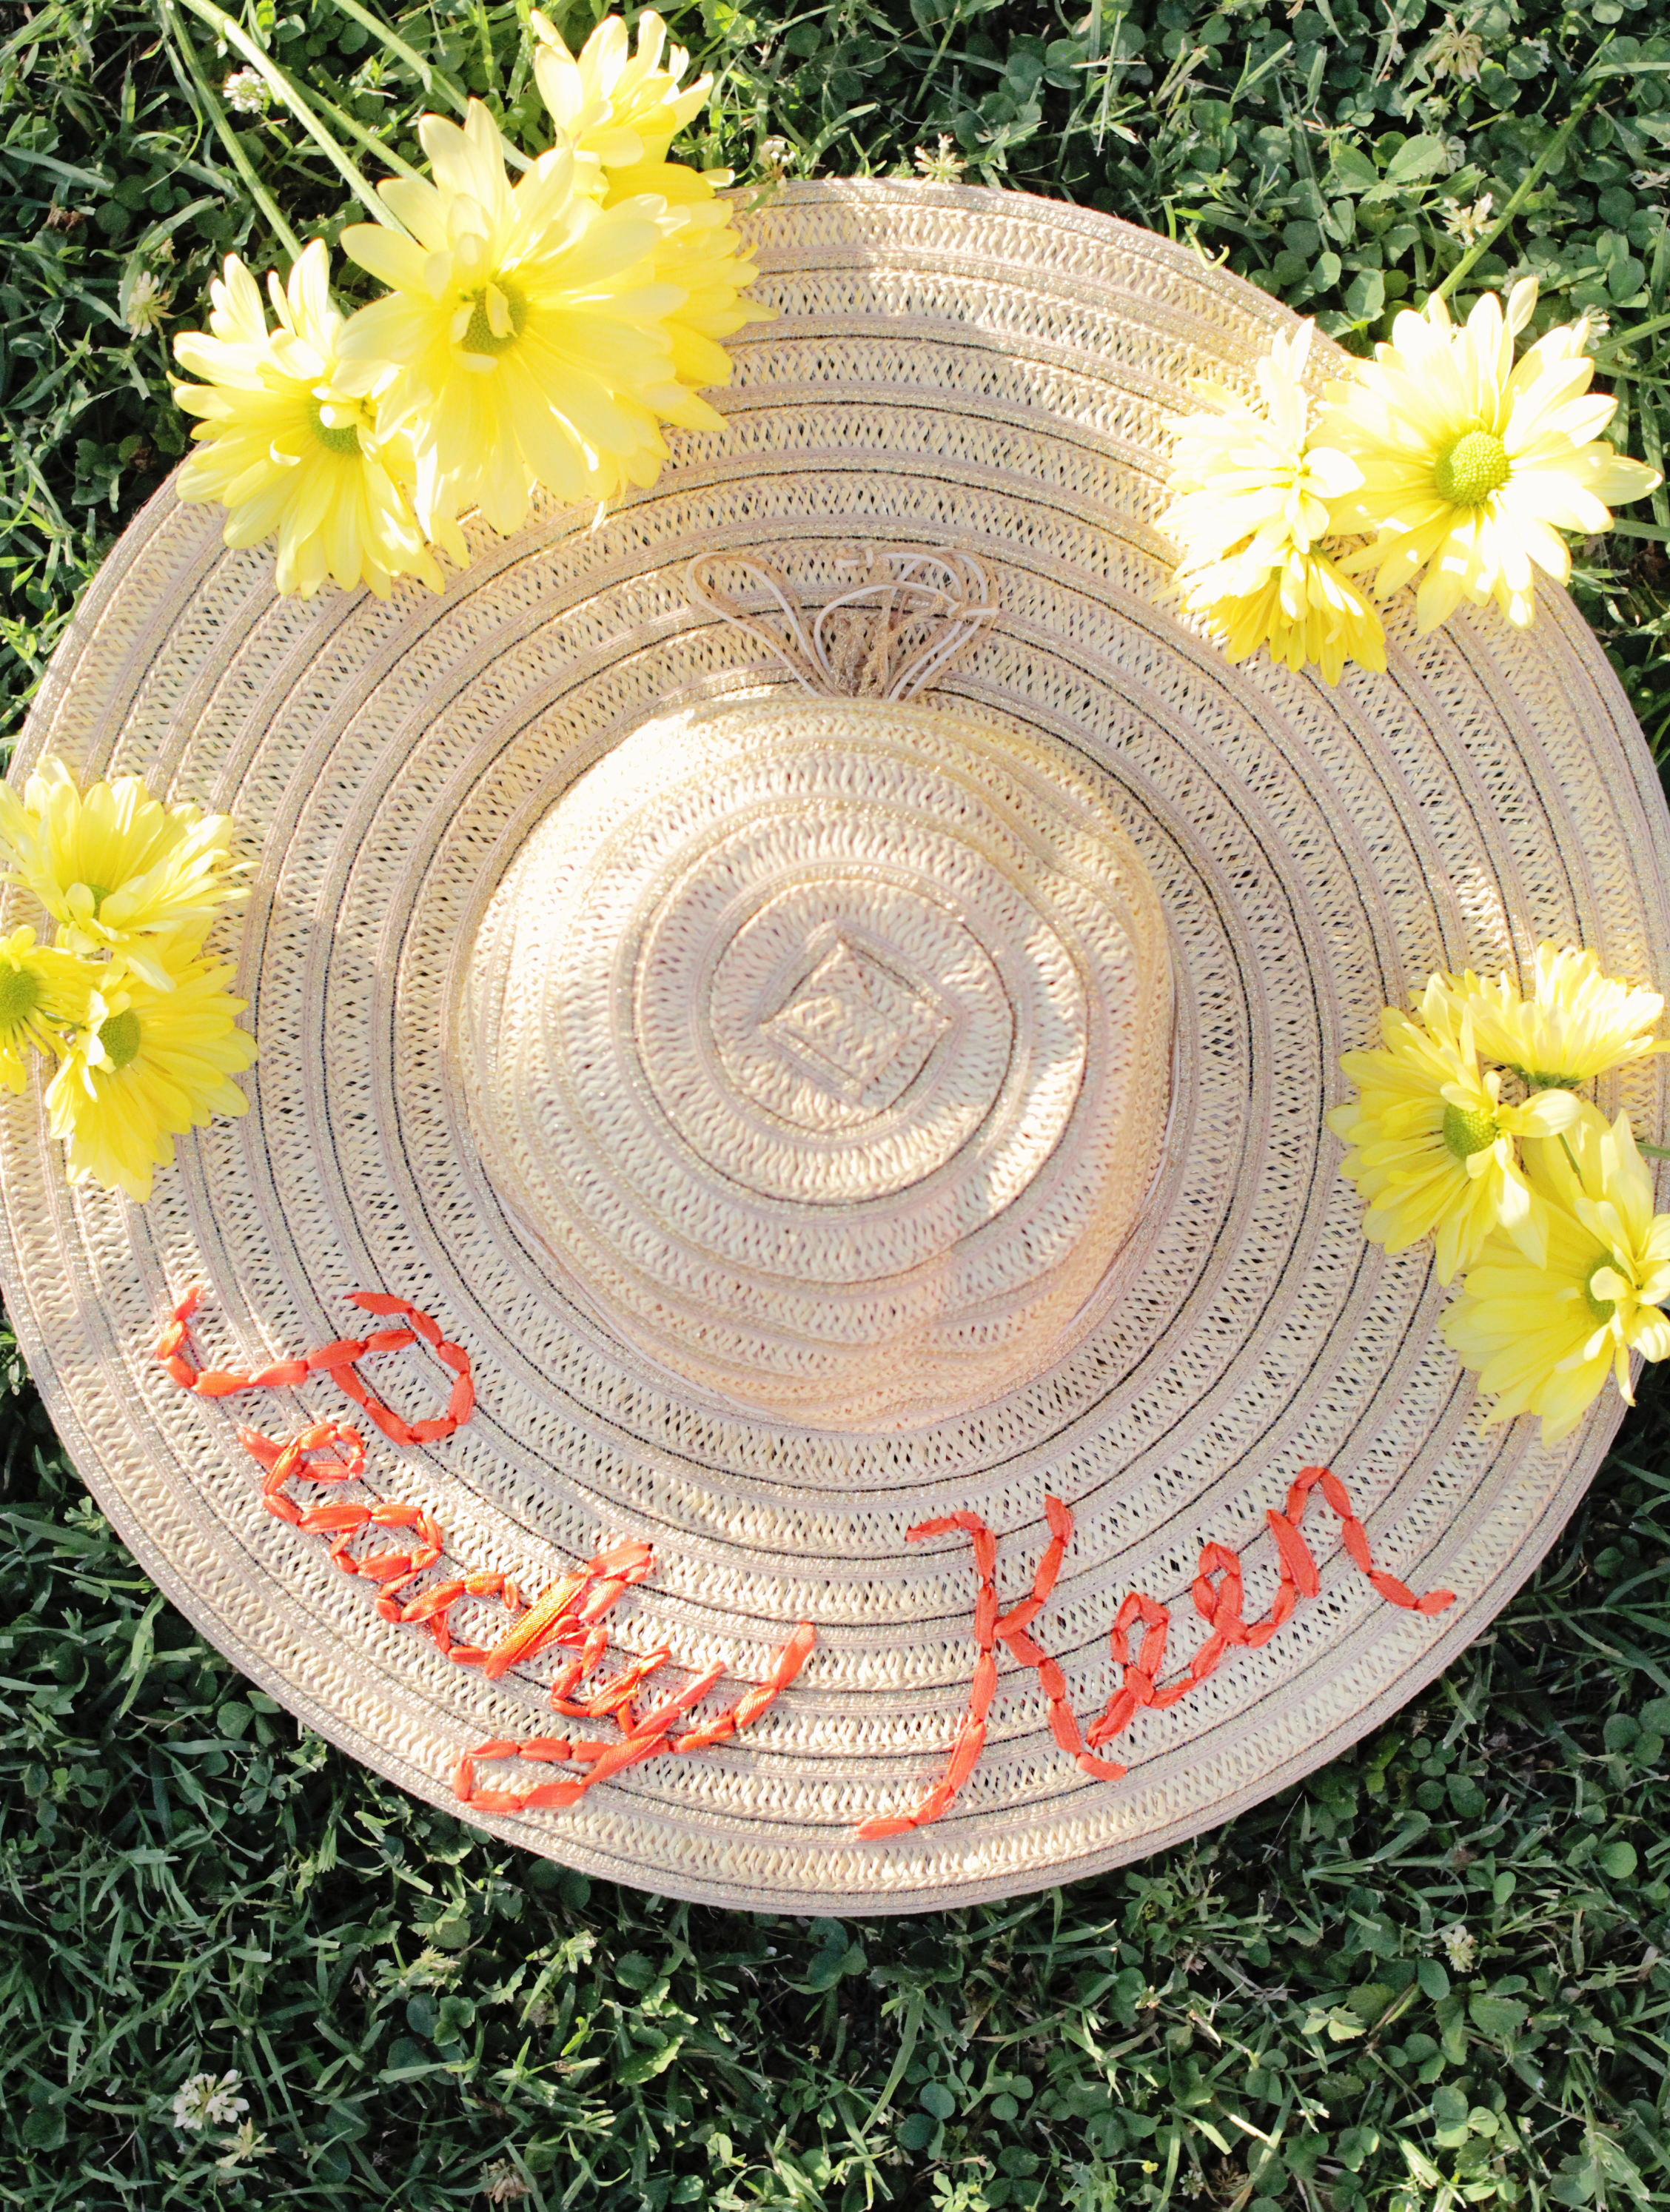 Darling embroidered hat DIY